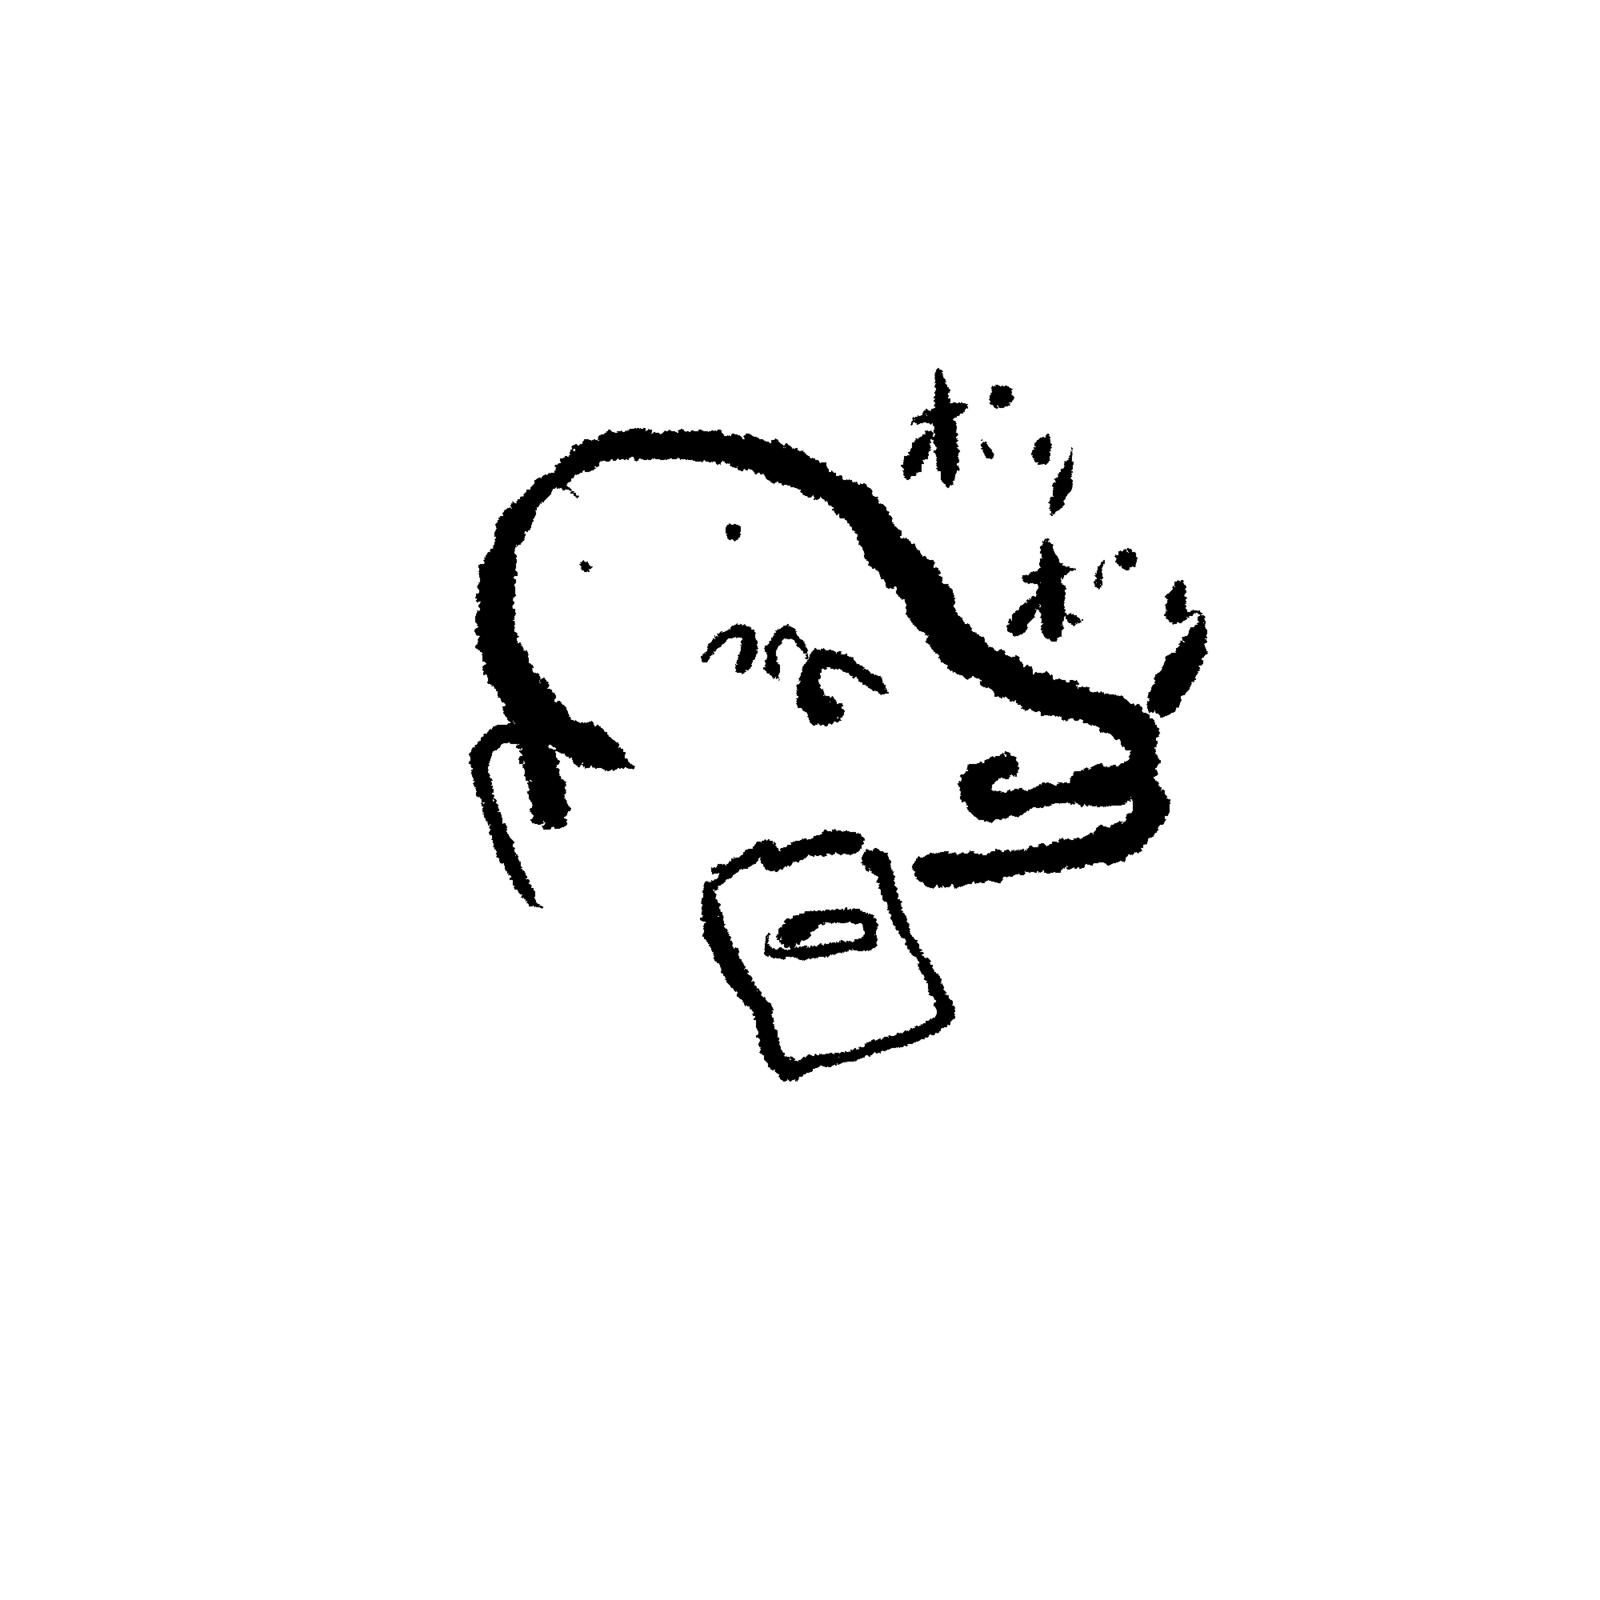 f:id:Haruosan:20200106062257p:plain